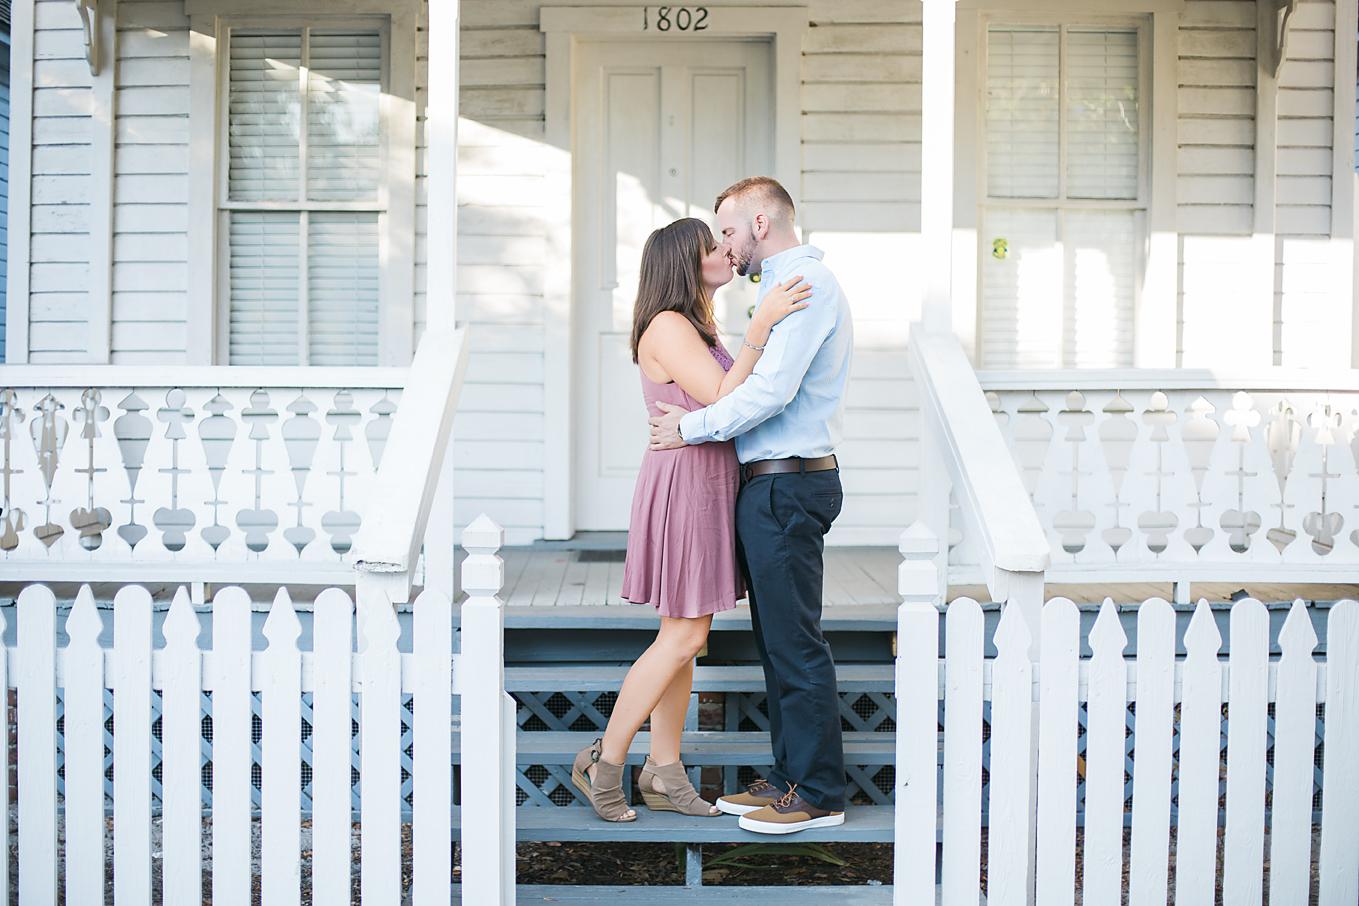 Caitlin + Matt - Ybor Tampa Wedding Photography - Sarasota Wedding Photography - Emily & Co. Photography - Sarasota Engagement Photography - University of Tampa (1).jpg